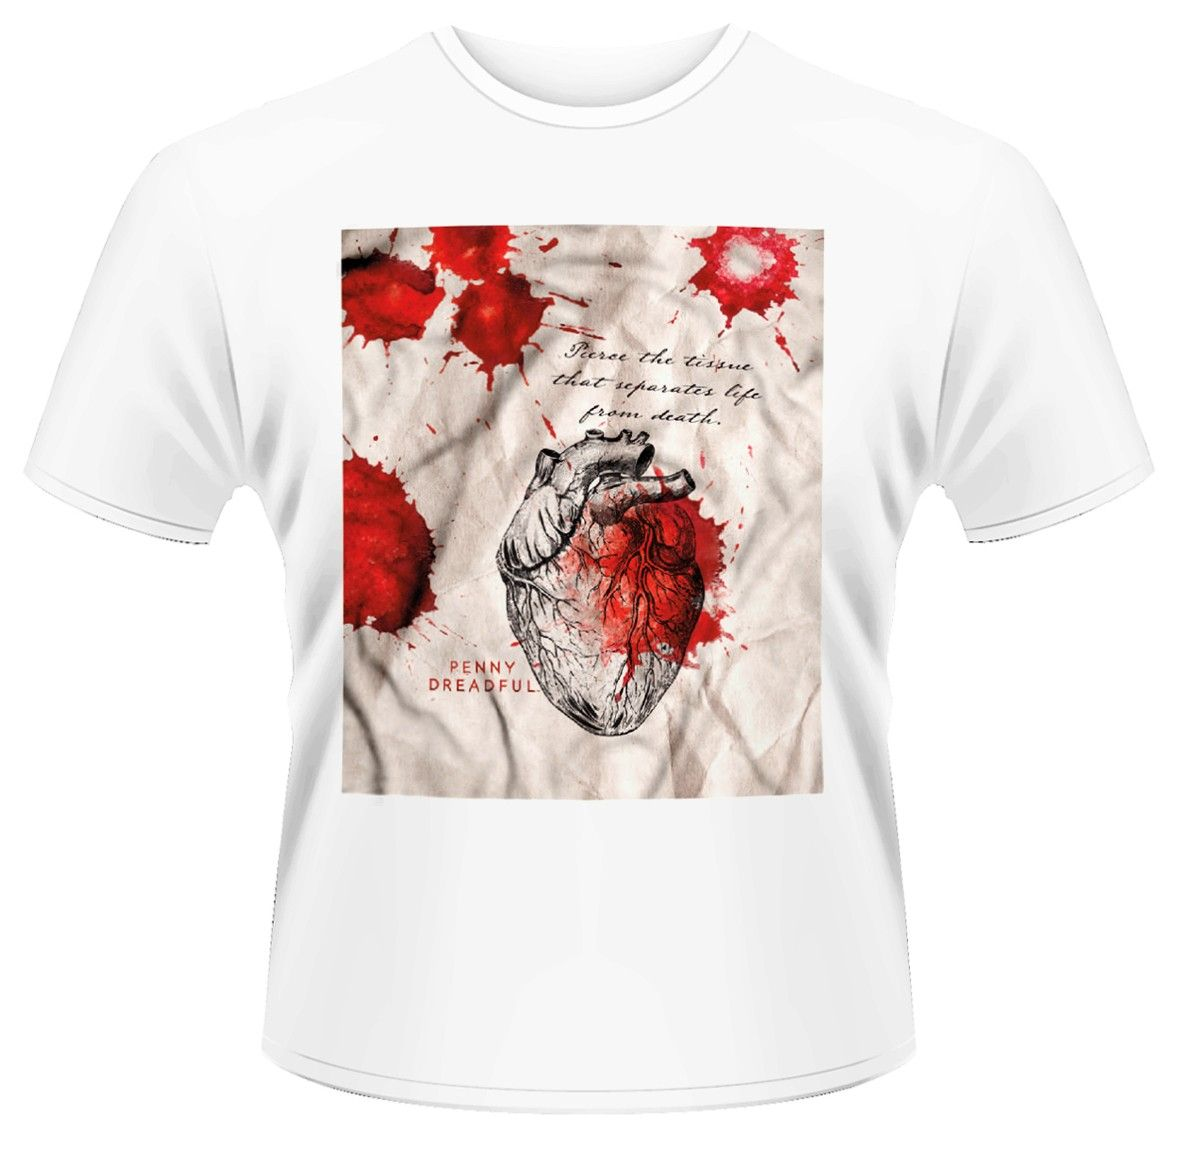 Penny Dreadful 'Peace, Life & Death' T-Shirt